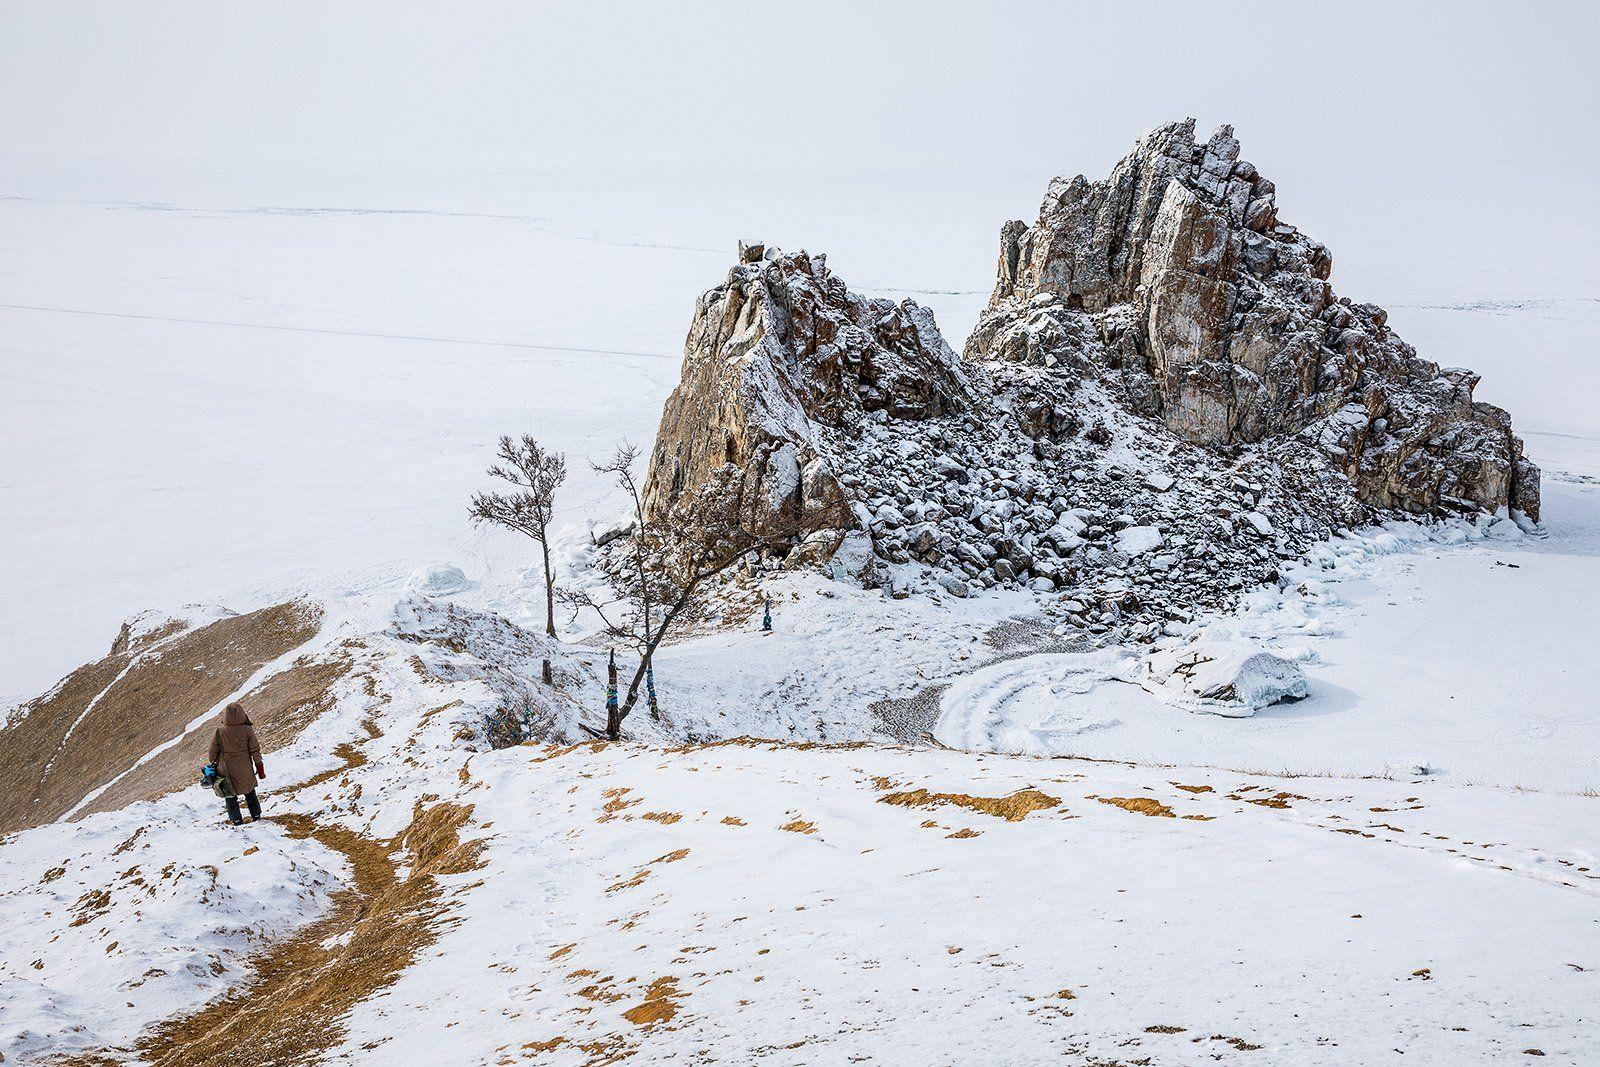 Байкал, лед, Ольхон, Власов Егор